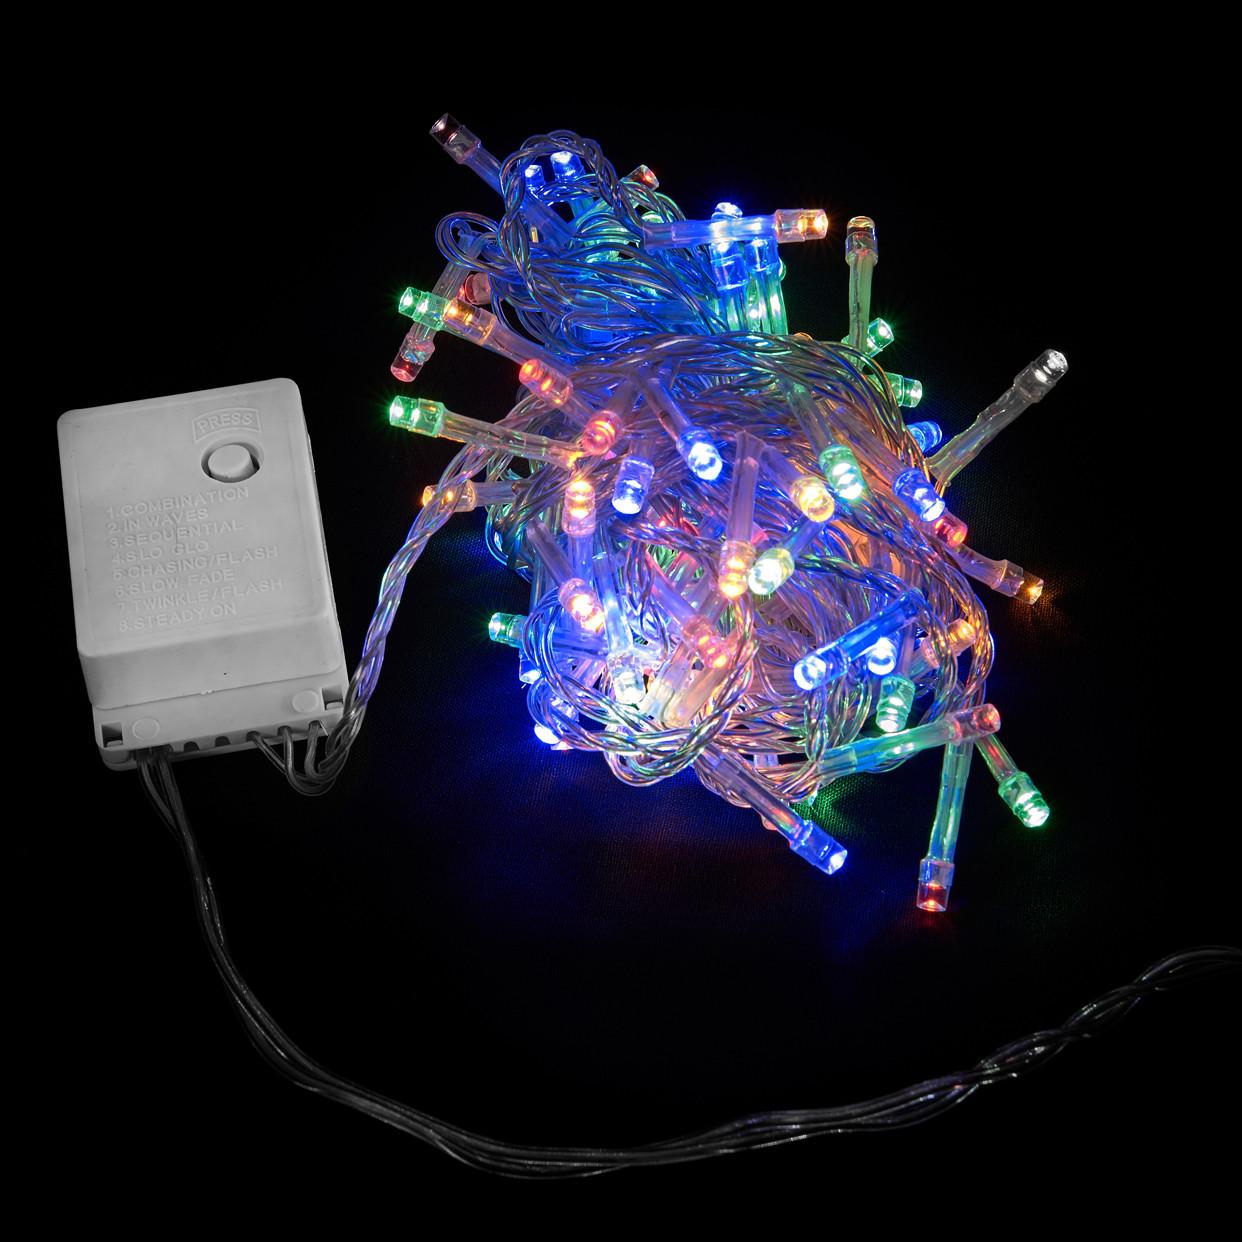 Гирлянда вннутренняя DELUX STRING С 100LED 5m мулт/прозр IP20